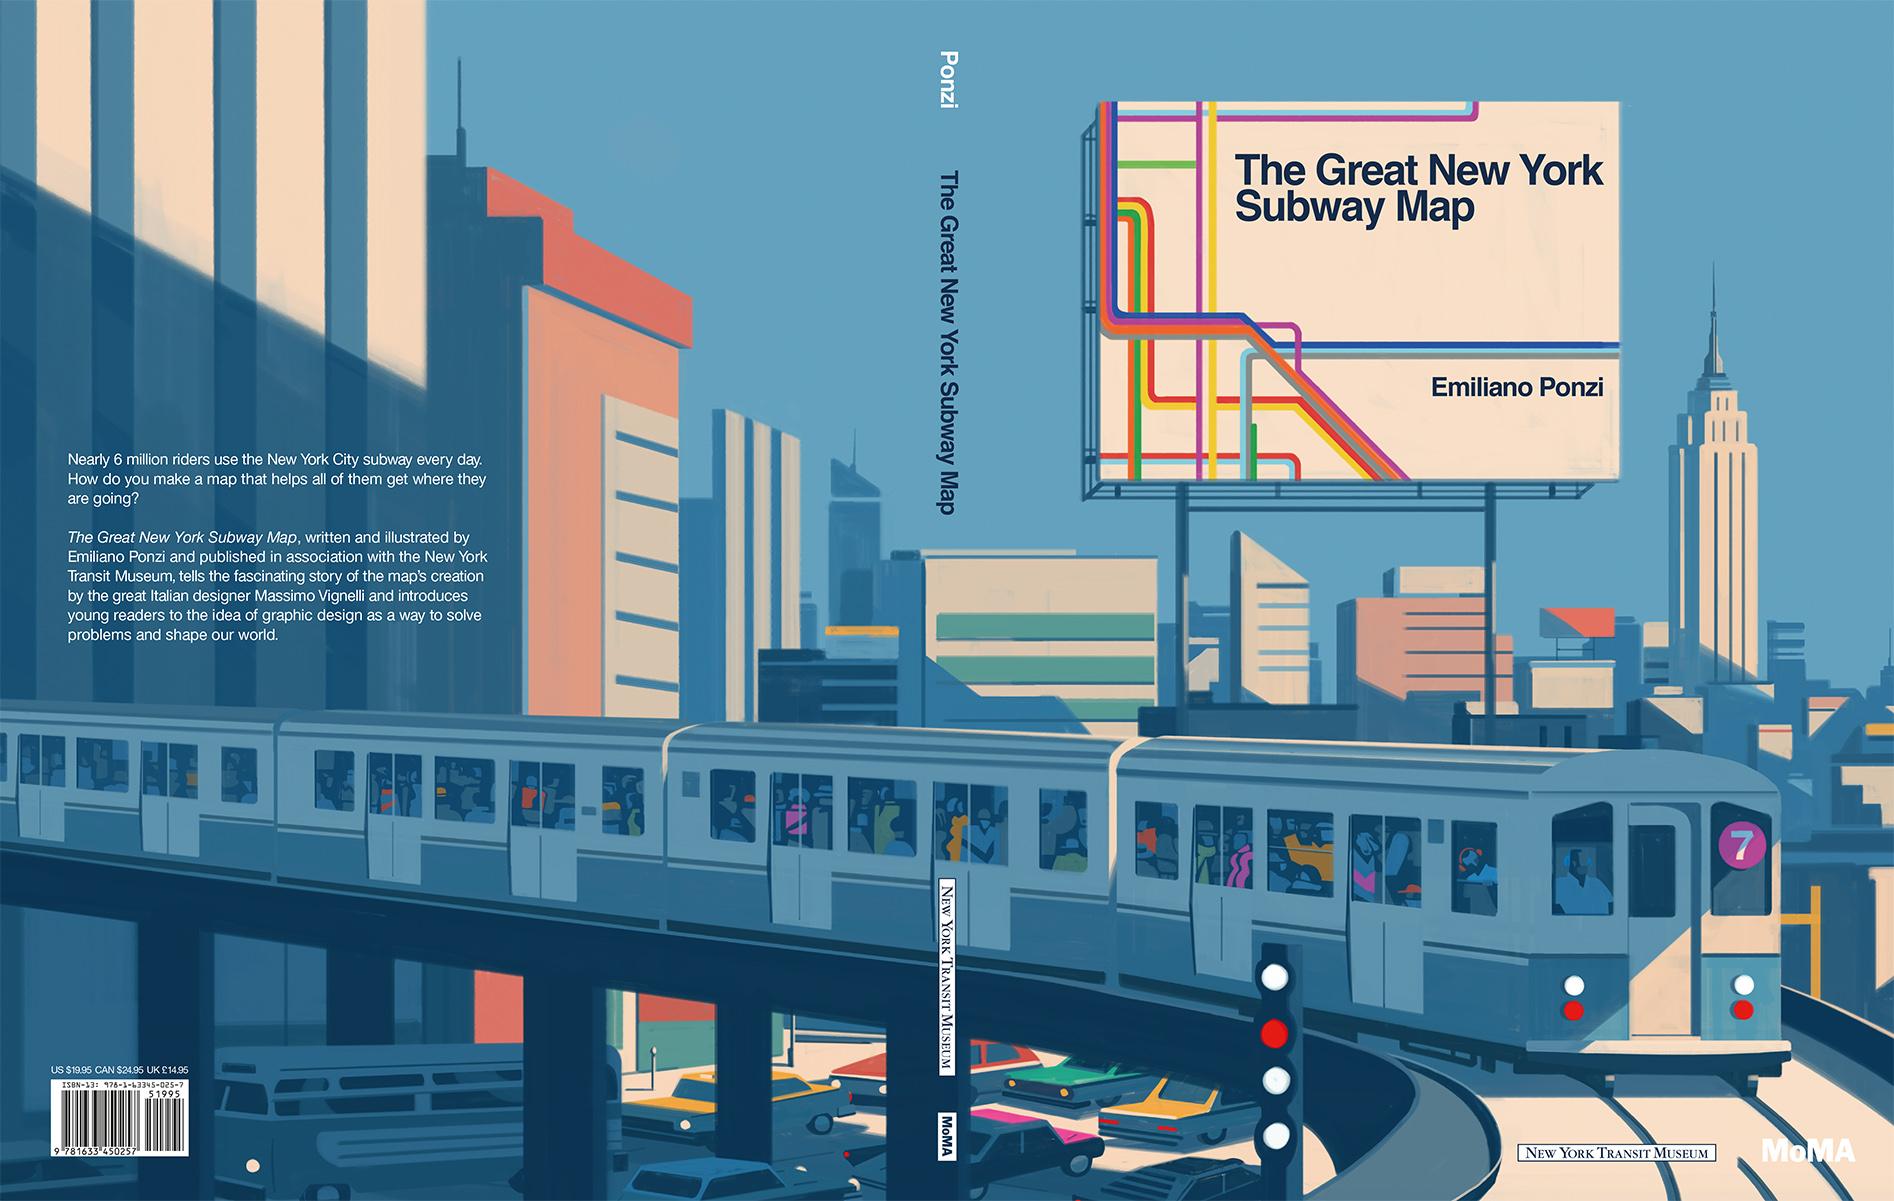 GreatNYSubwayMap_MoMA_1.jpg